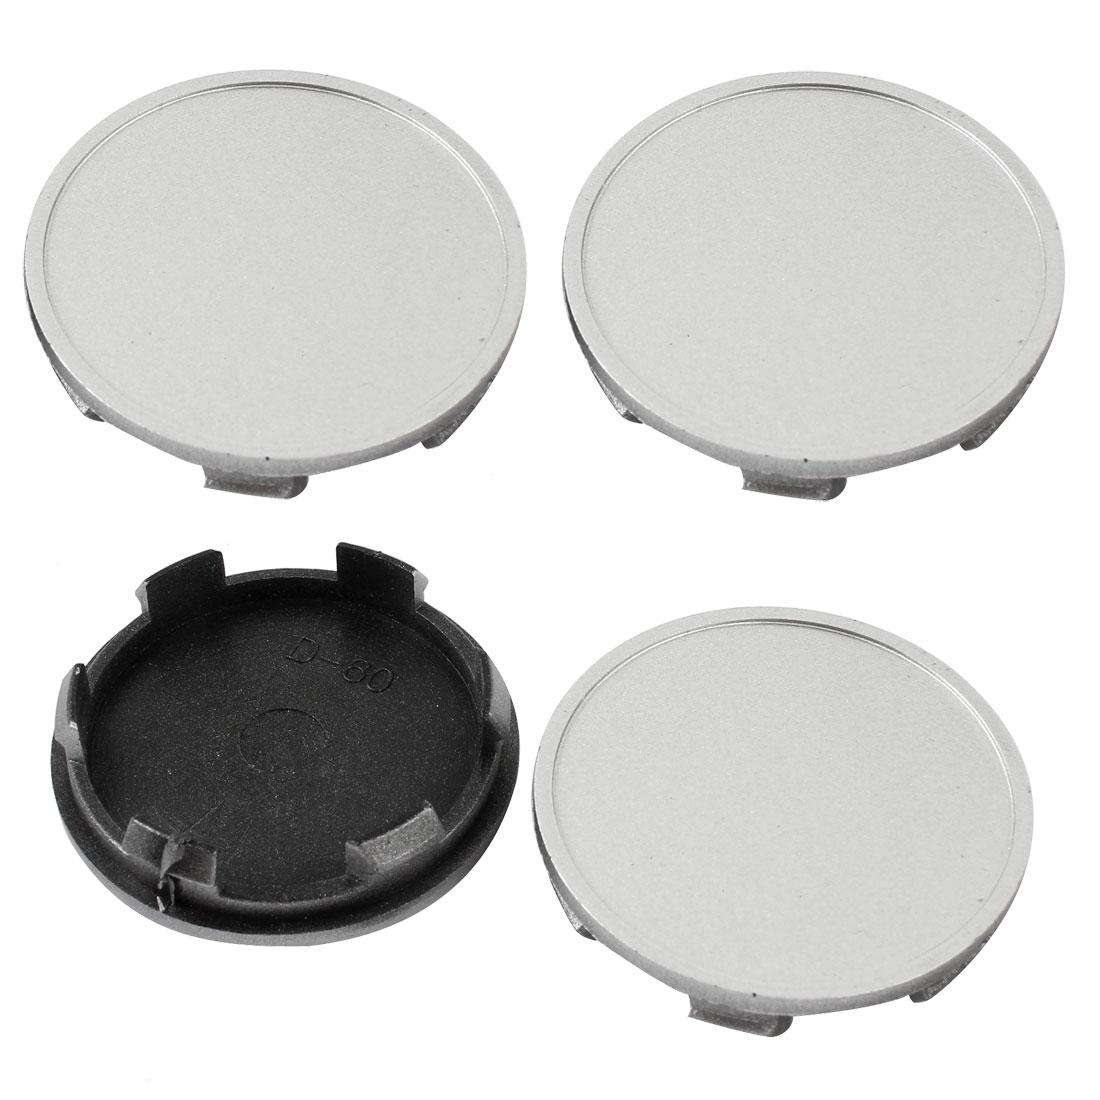 4 Pcs 60mm Dia Car Hood Emblem Wheel Center Hub Caps Covers Silver Tone